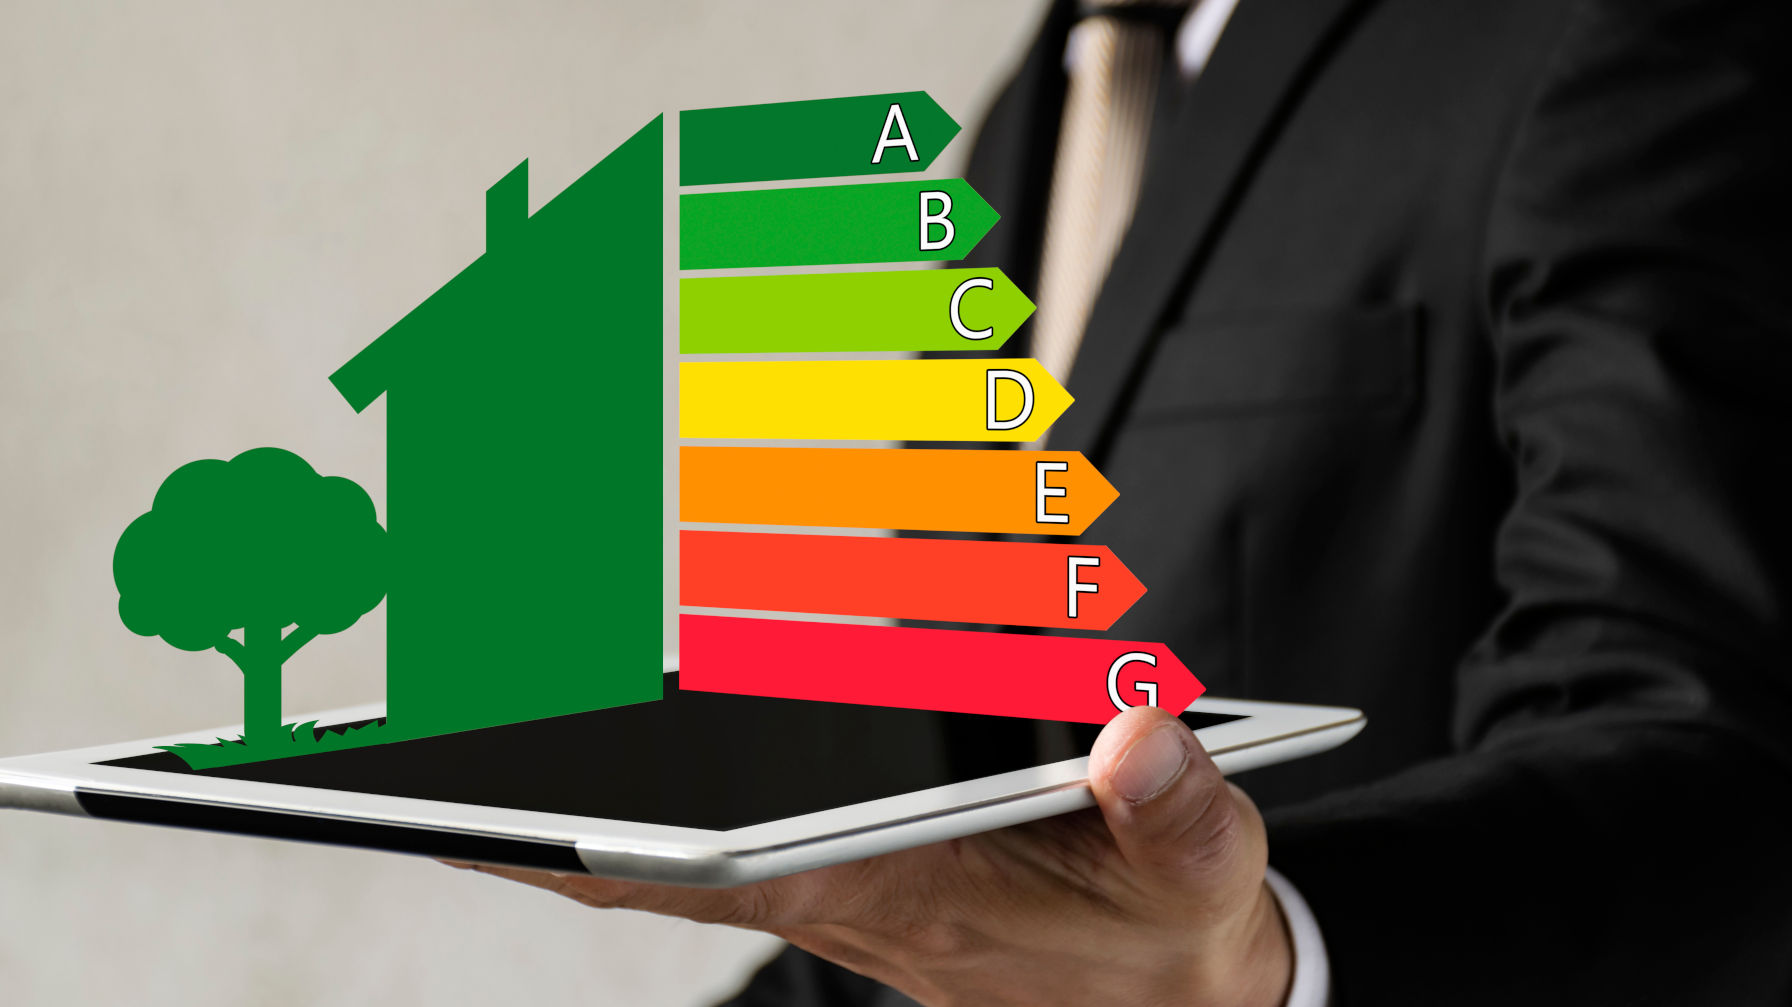 Improve energy efficiency with domotics